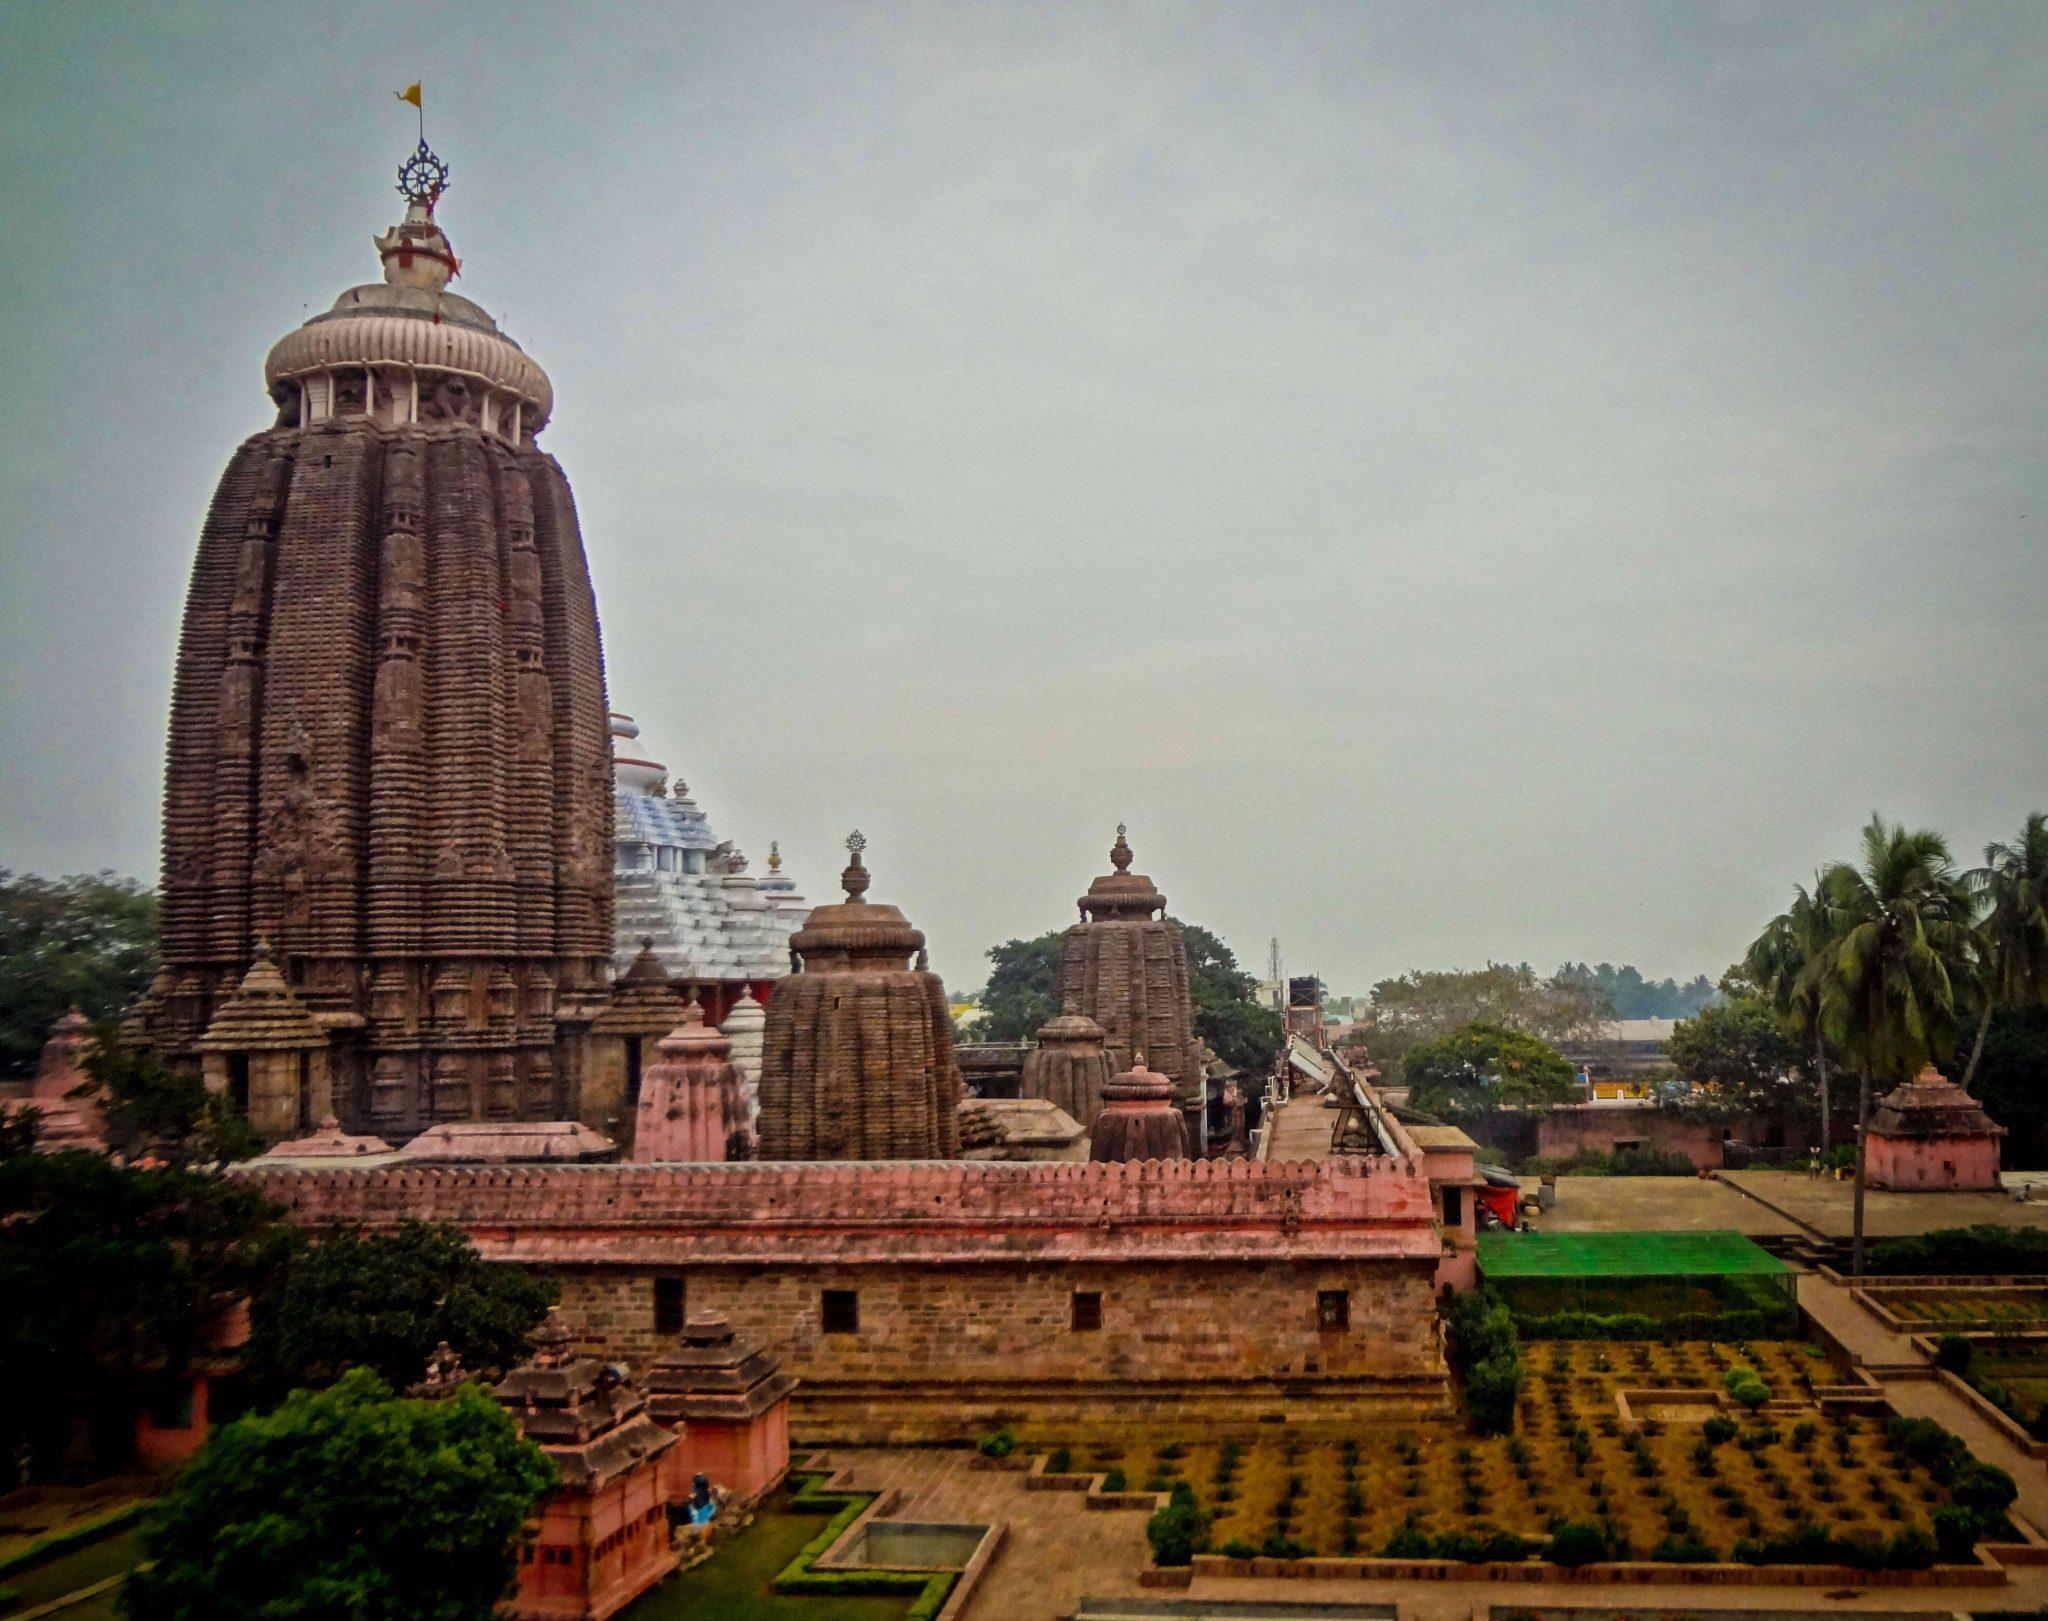 Jagganath temple, Puri